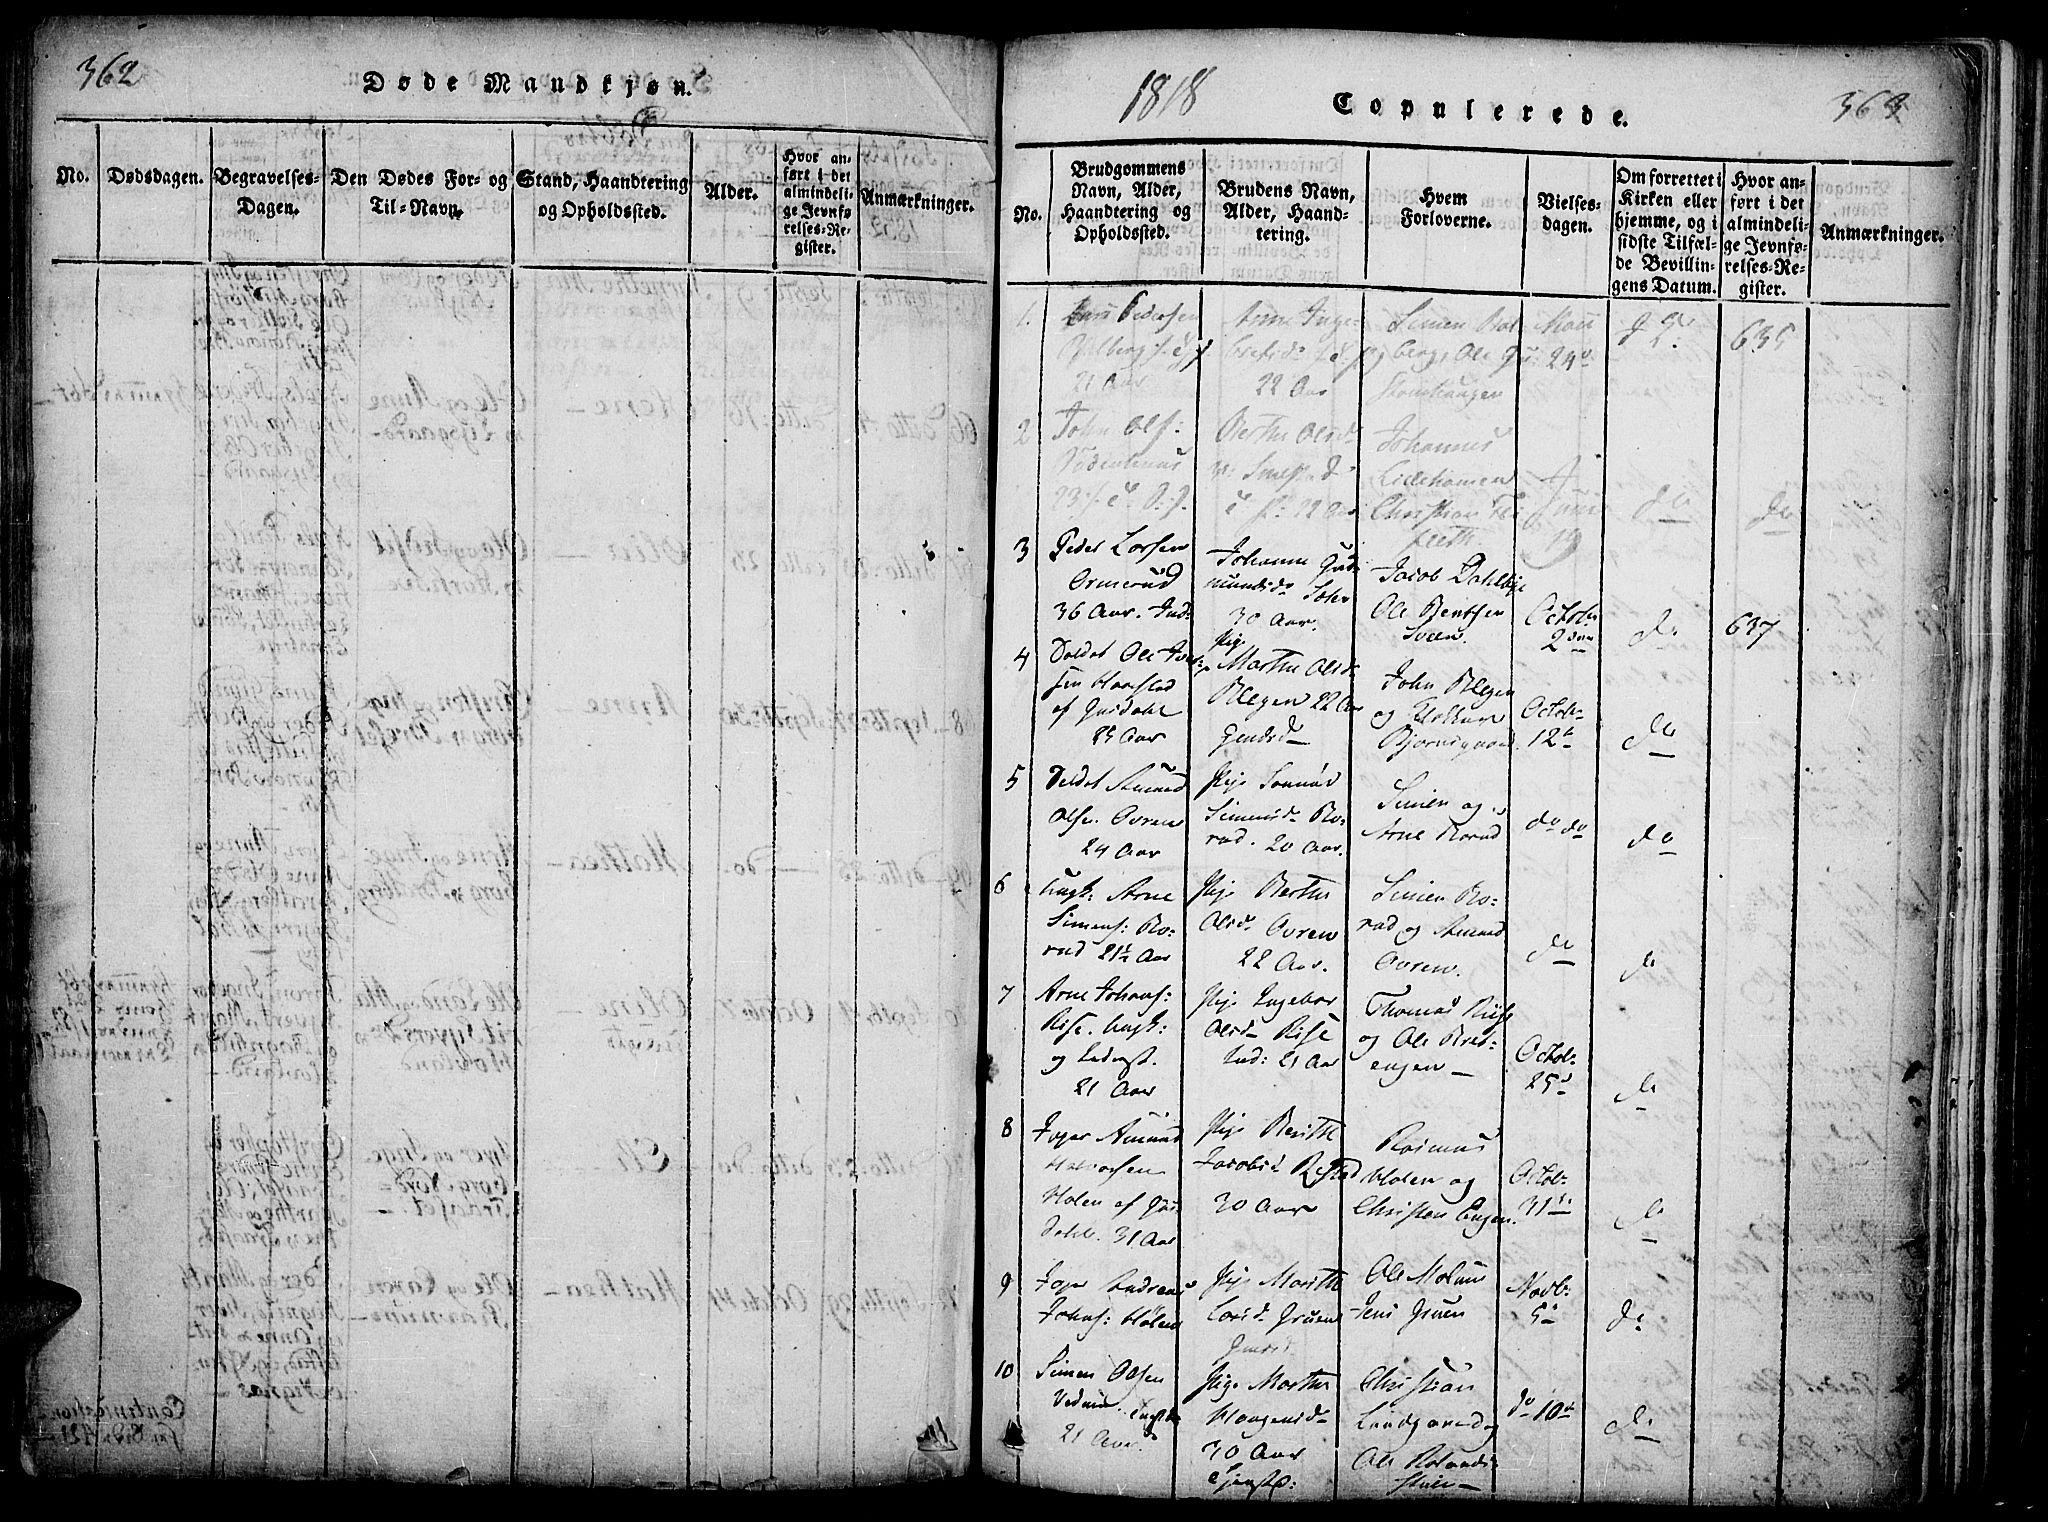 SAH, Fåberg prestekontor, Ministerialbok nr. 3, 1818-1833, s. 362-363